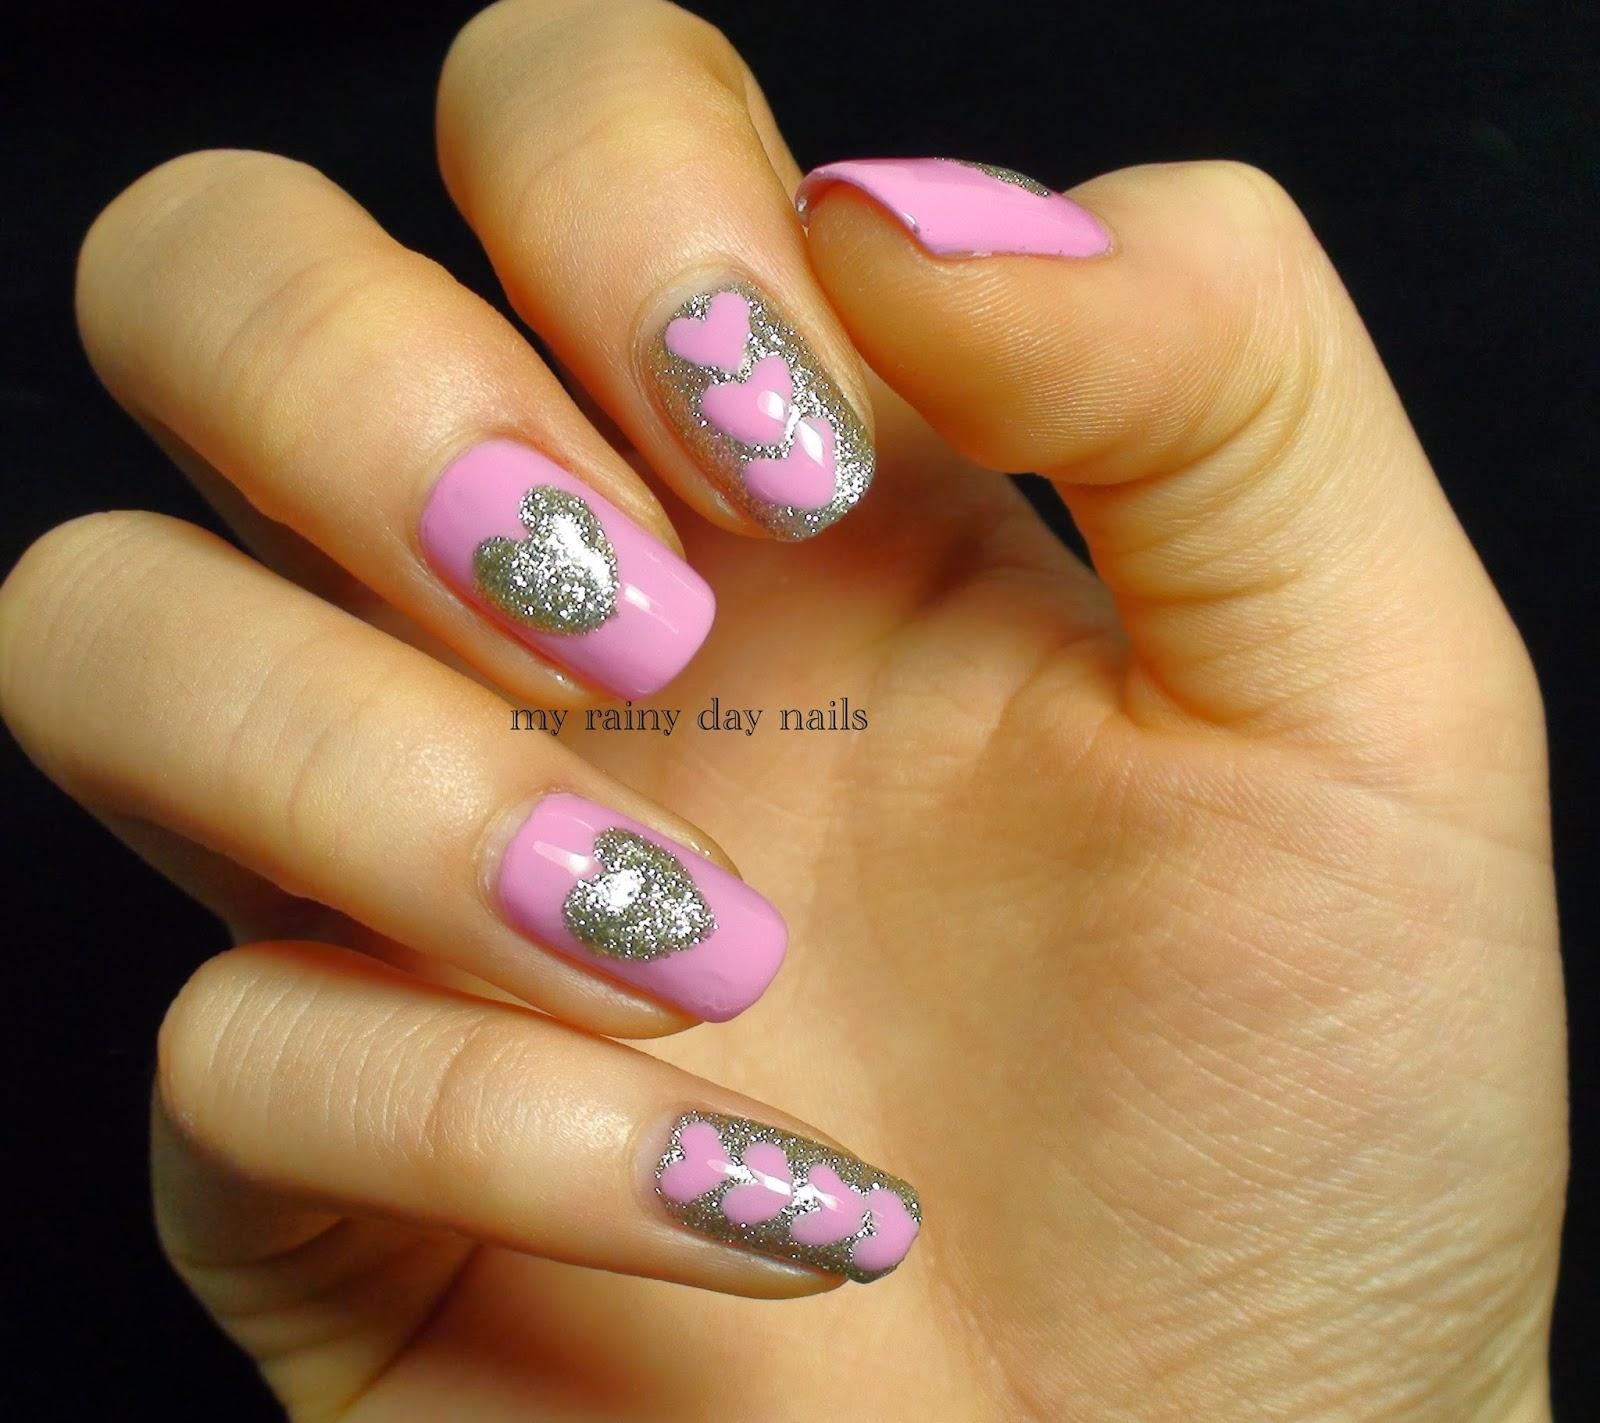 Nail Art February Challenge: My Rainy Day Nails: Nail Art Feb Challenge- Hearts